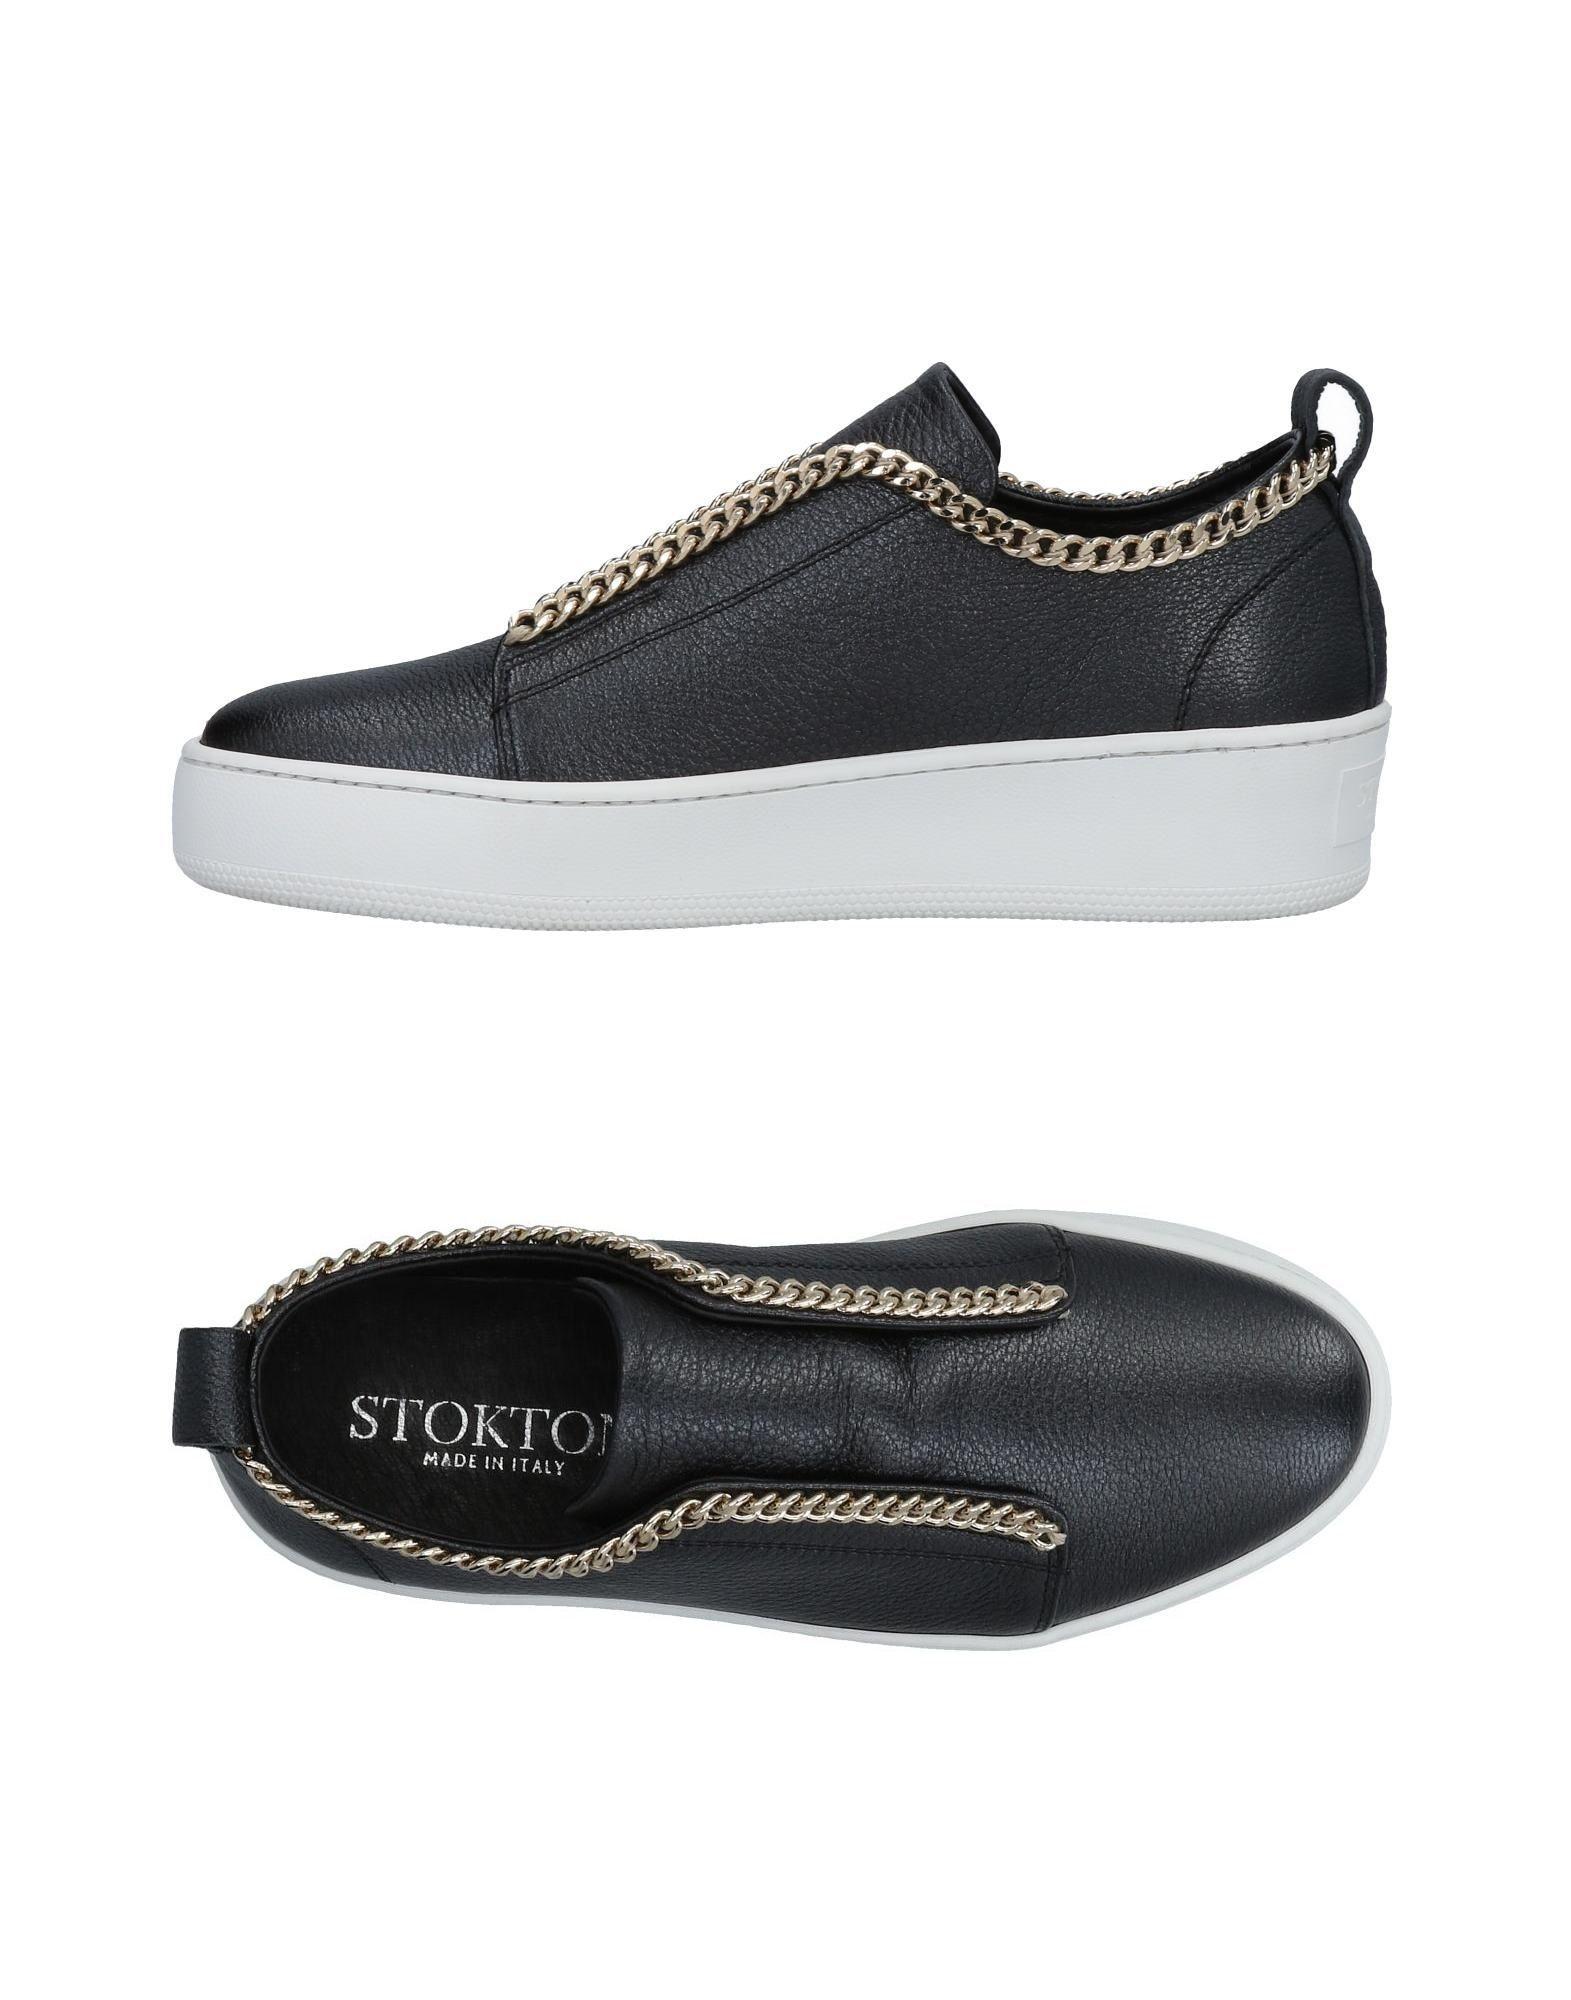 Stokton Sneakers Damen  11486043TQ Gute beliebte Qualität beliebte Gute Schuhe 82f981